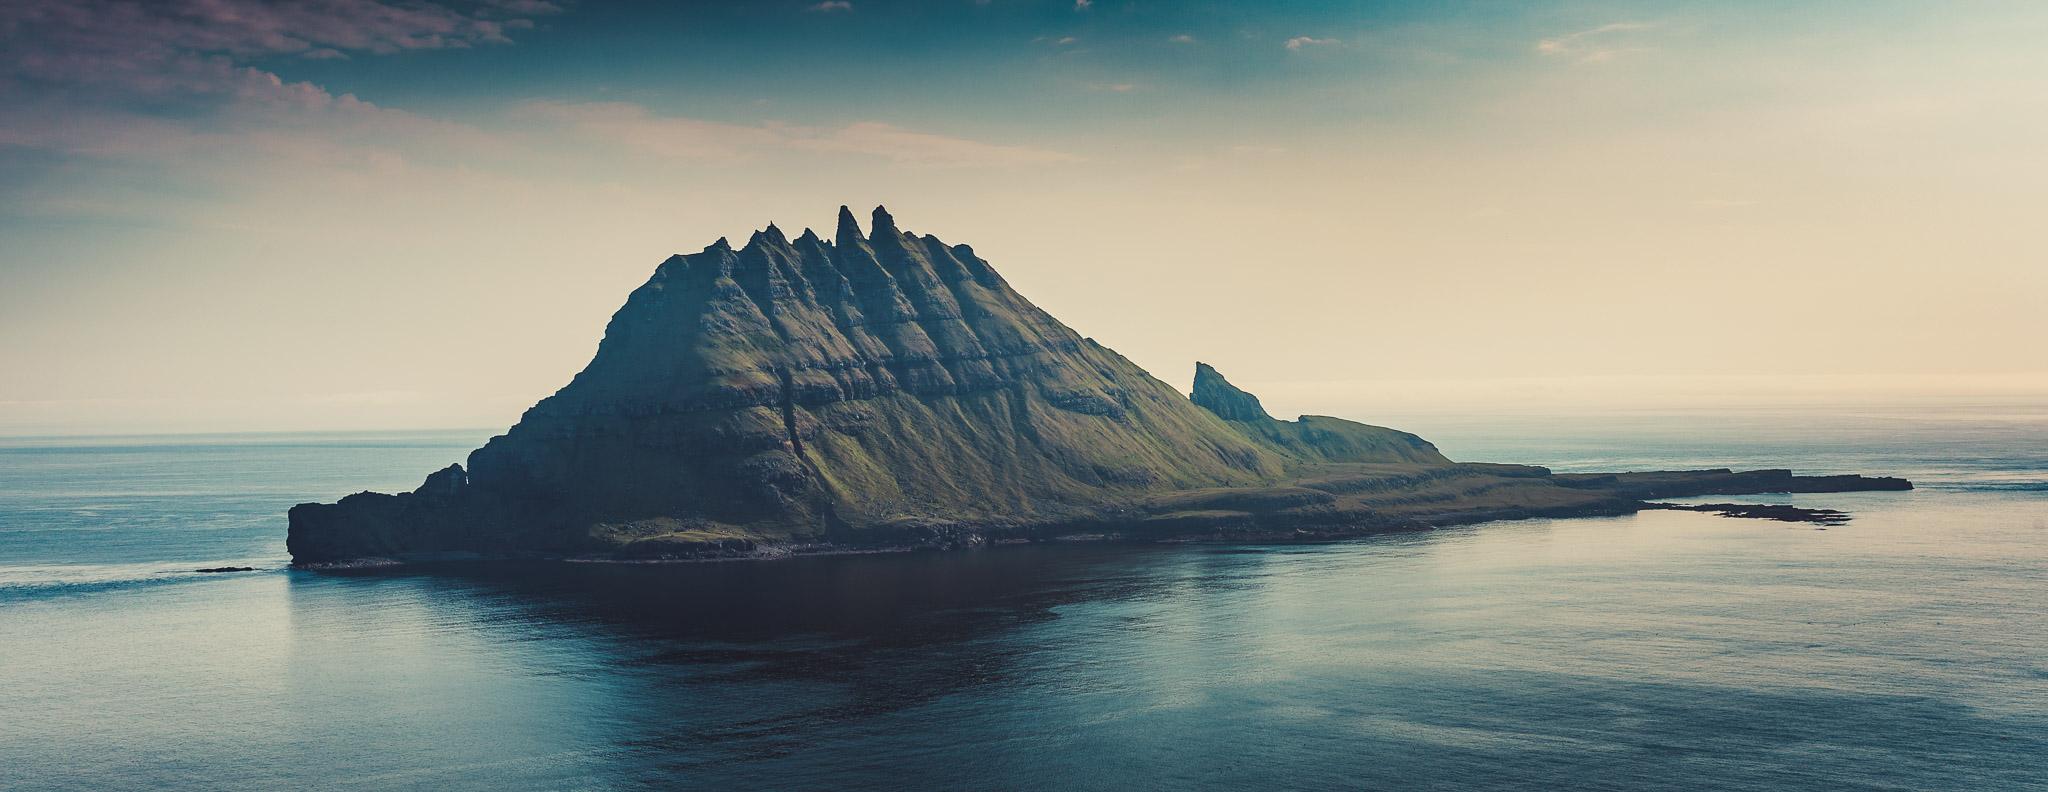 Gassadalur, Faroe Islands